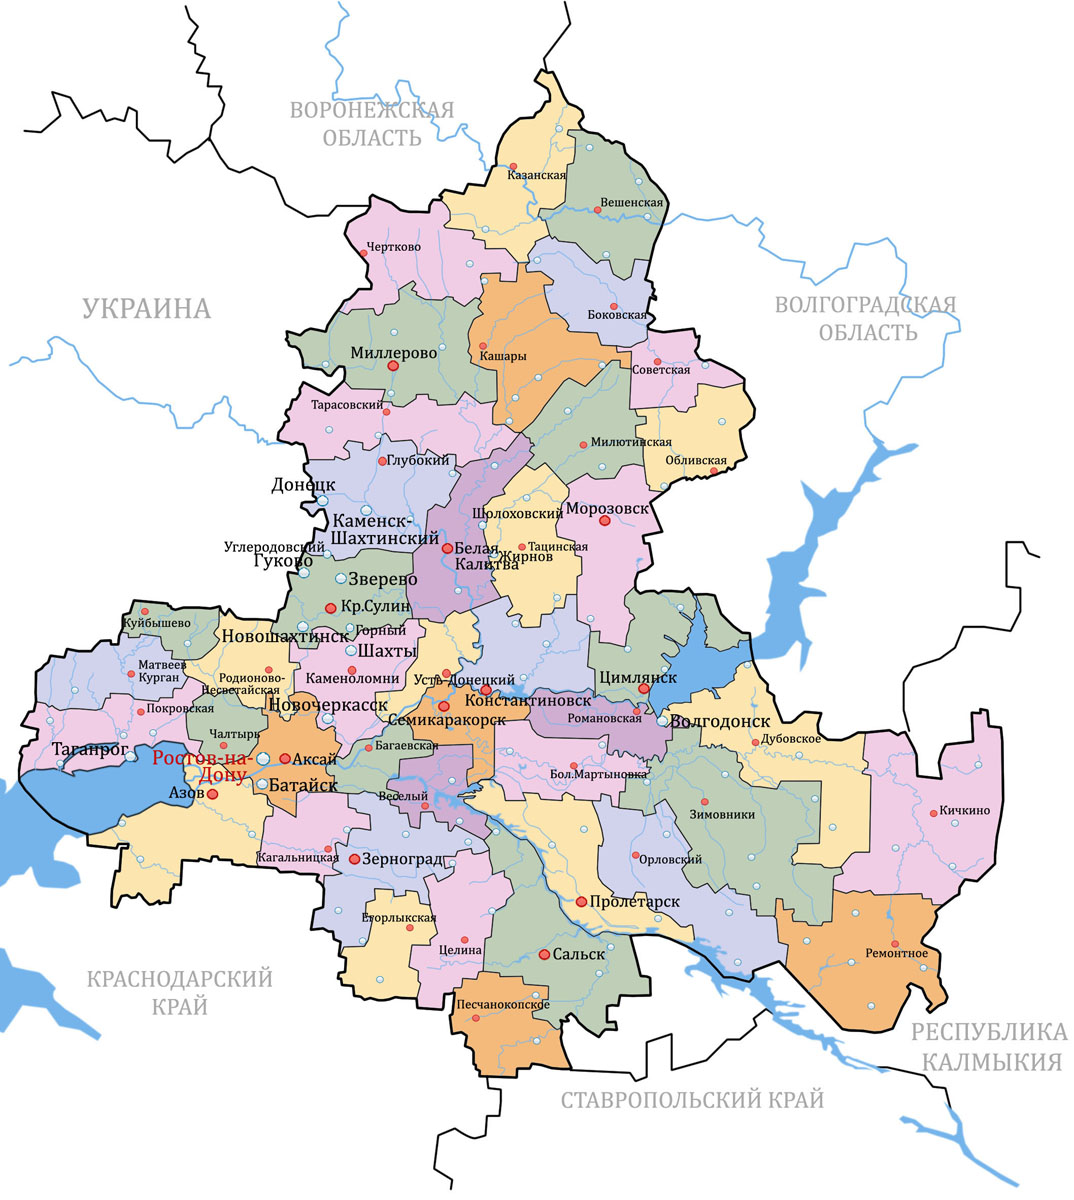 Карта Ростовской Области - murmanskmebel: http://murmanskmebel.weebly.com/blog/karta-rostovskoj-oblasti